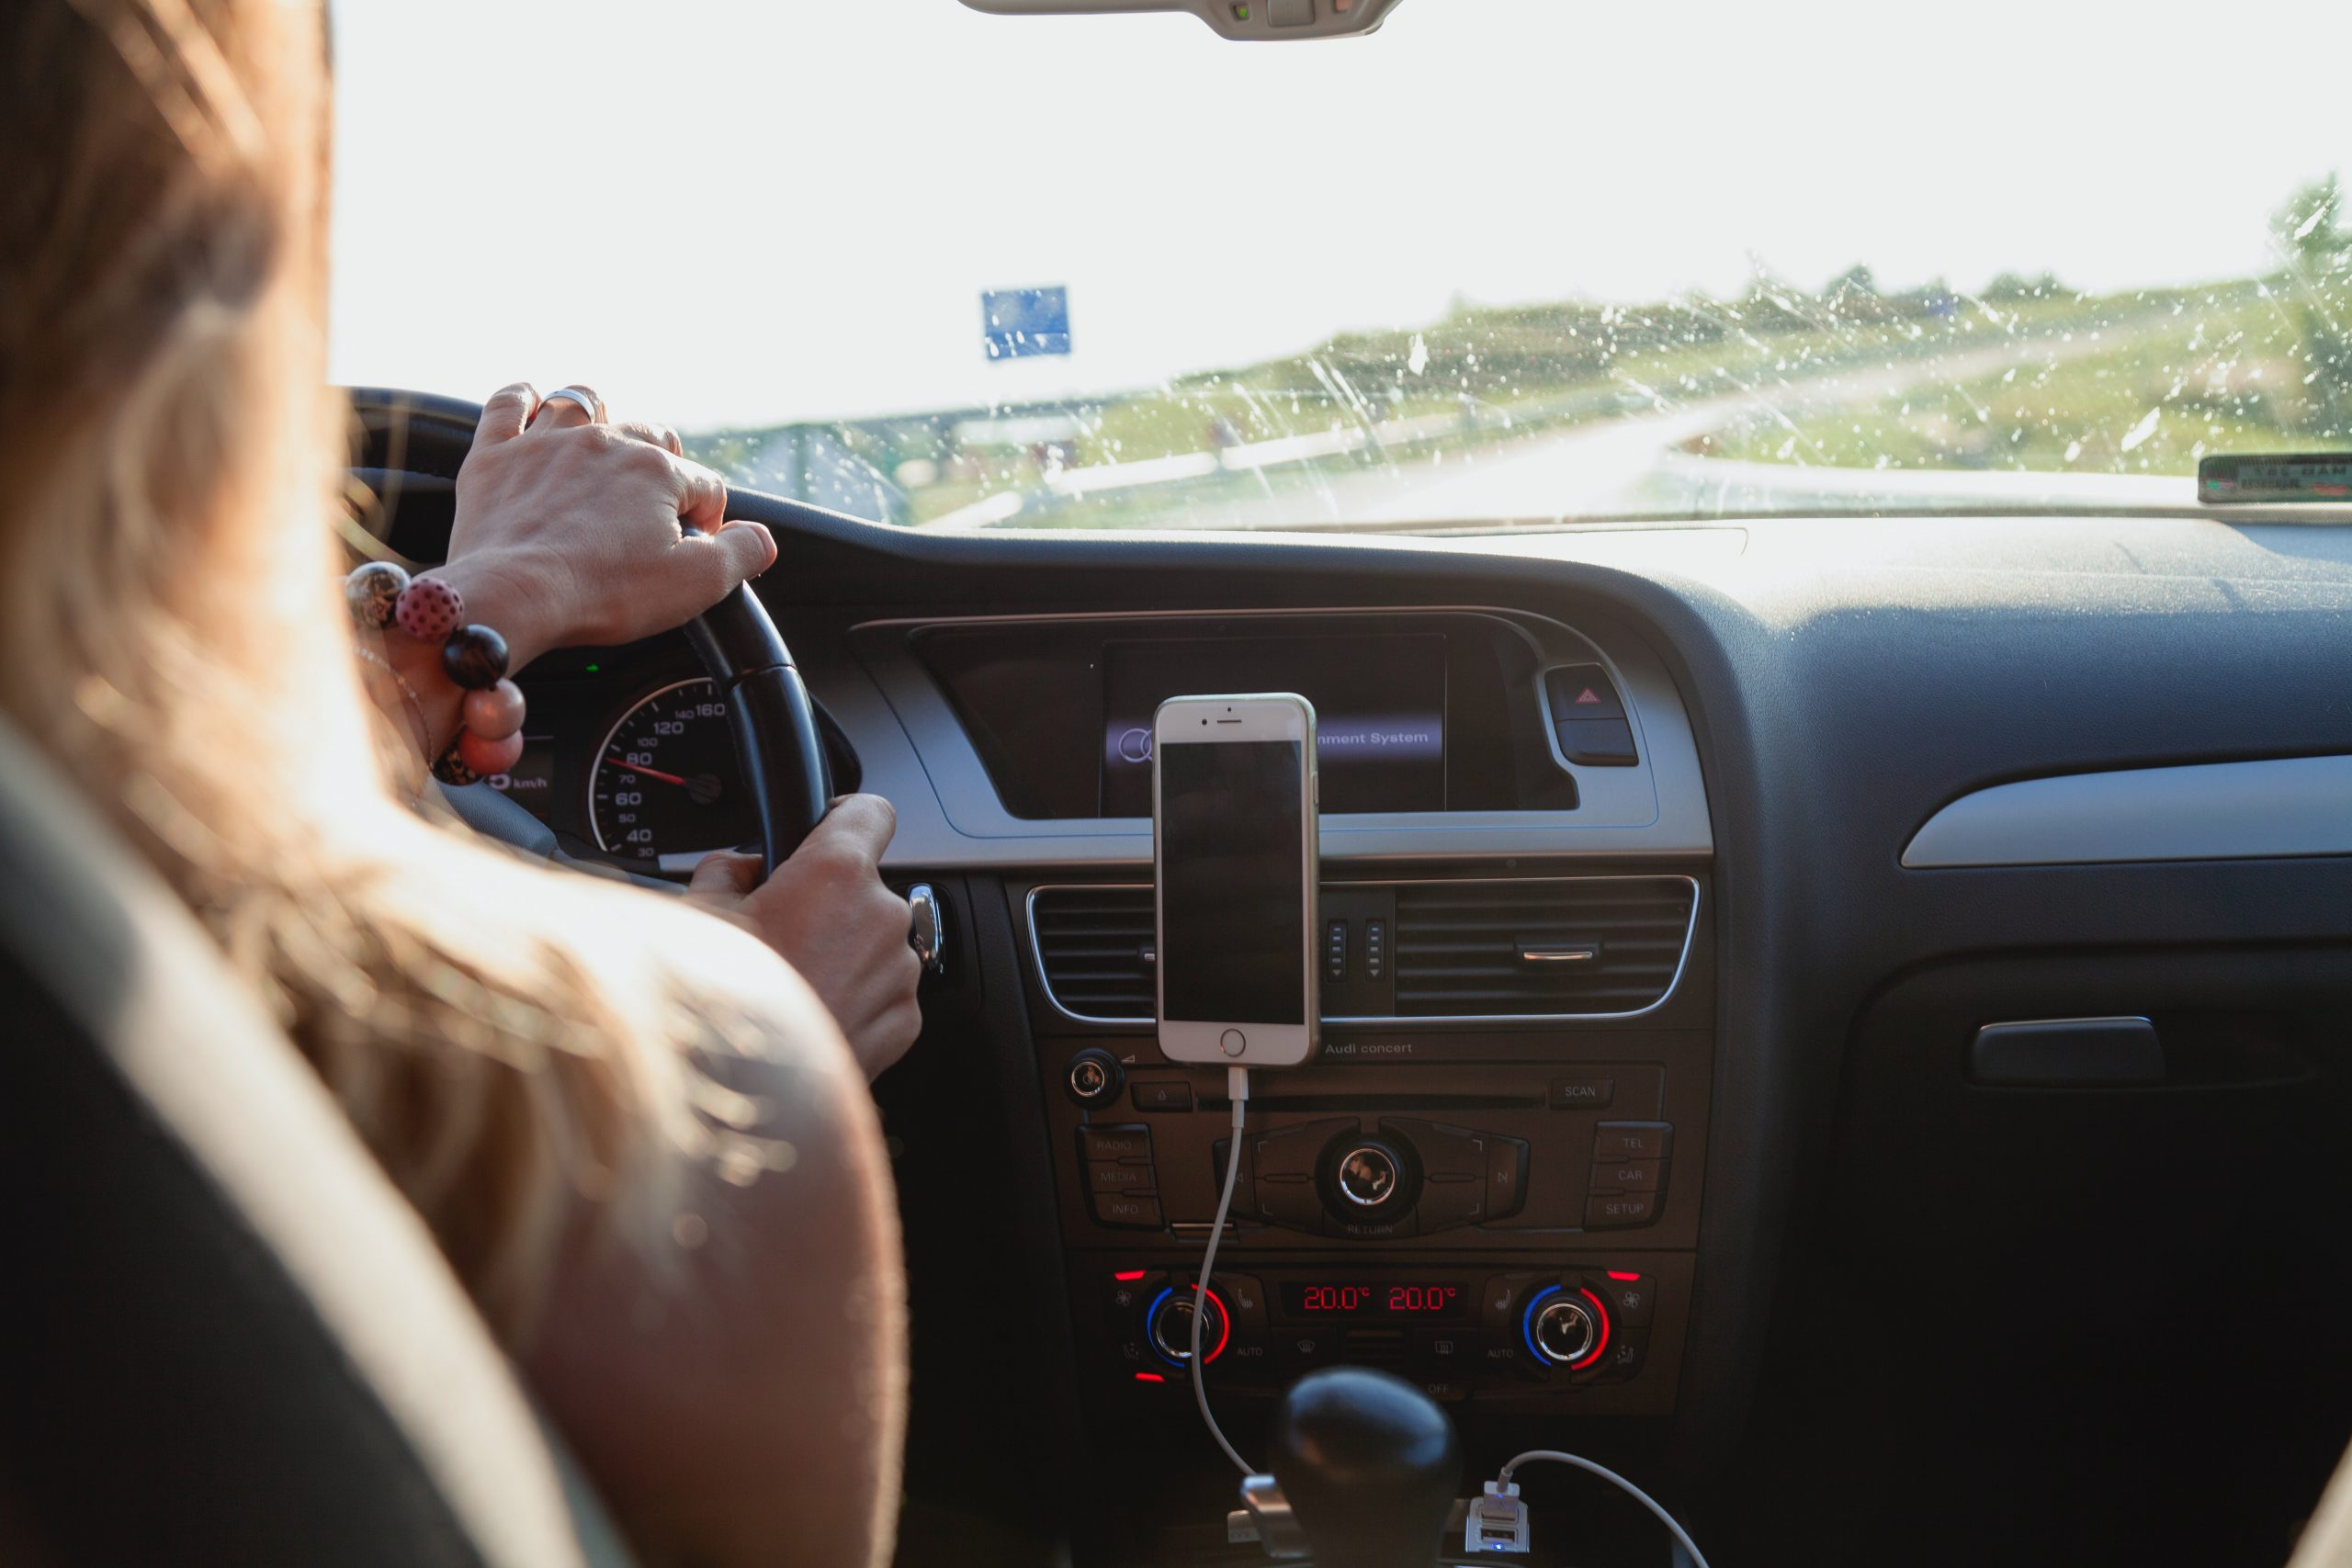 Consejos para aprender a conducir rápido